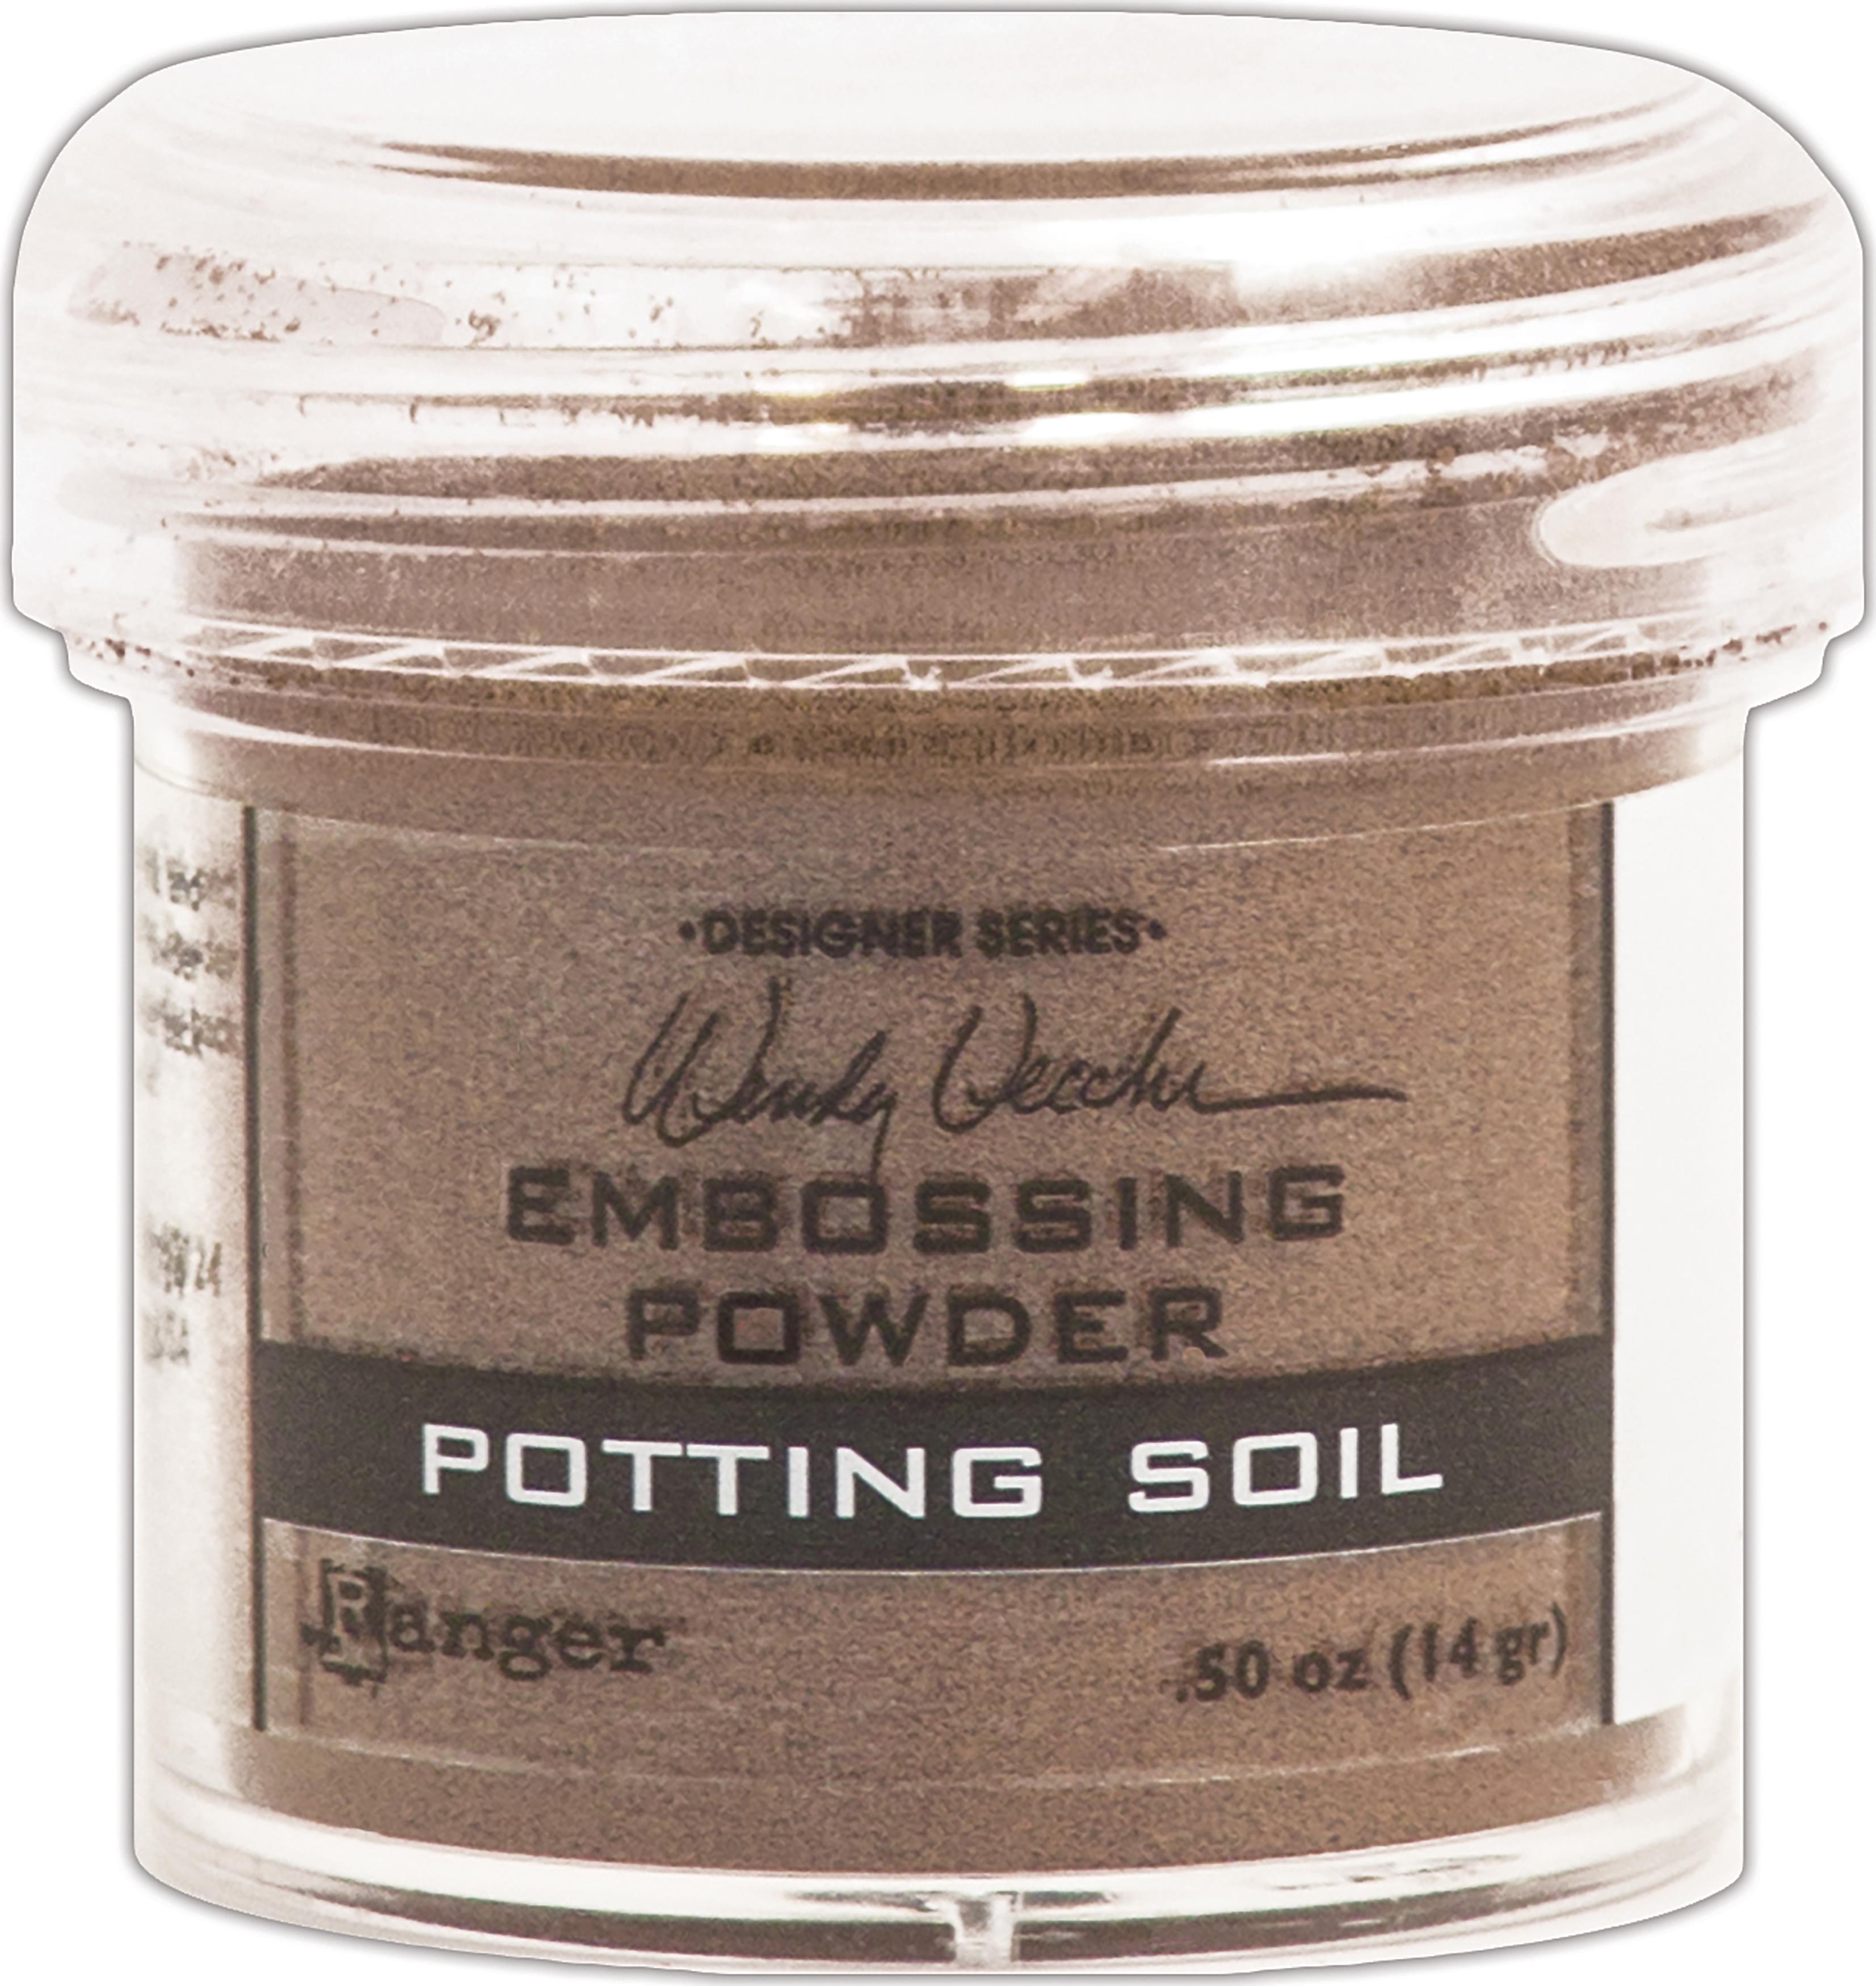 Wendy Vecchi Embossing Powder -Potting Soil